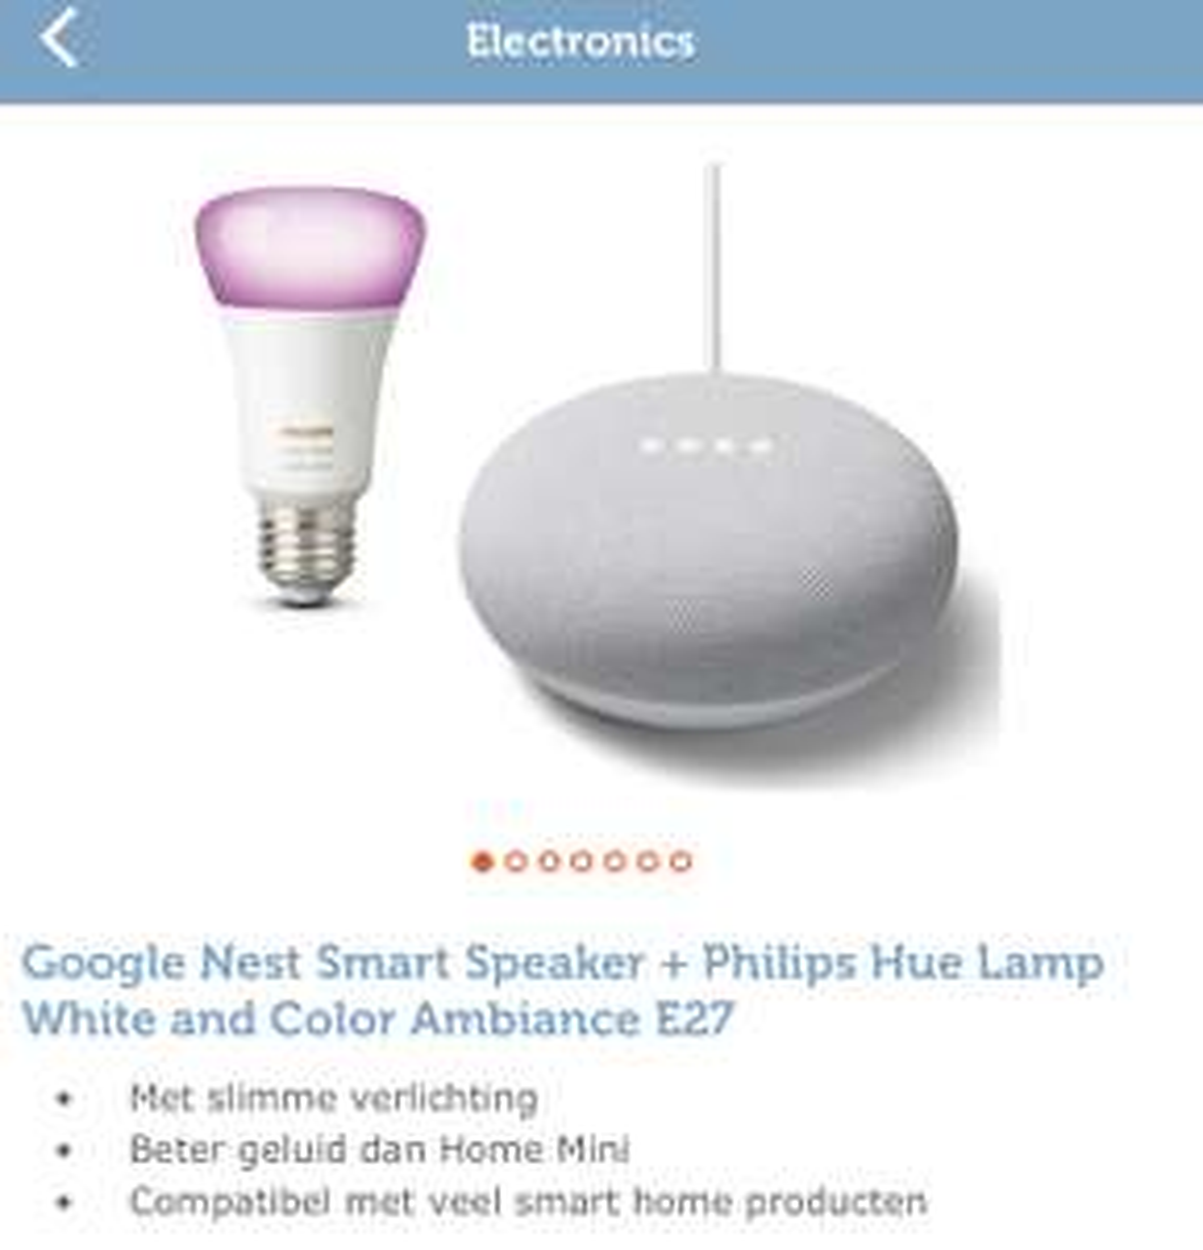 Googlez Nest Smart Speaker + Philips Hue Lamp White and Color Ambiance E27